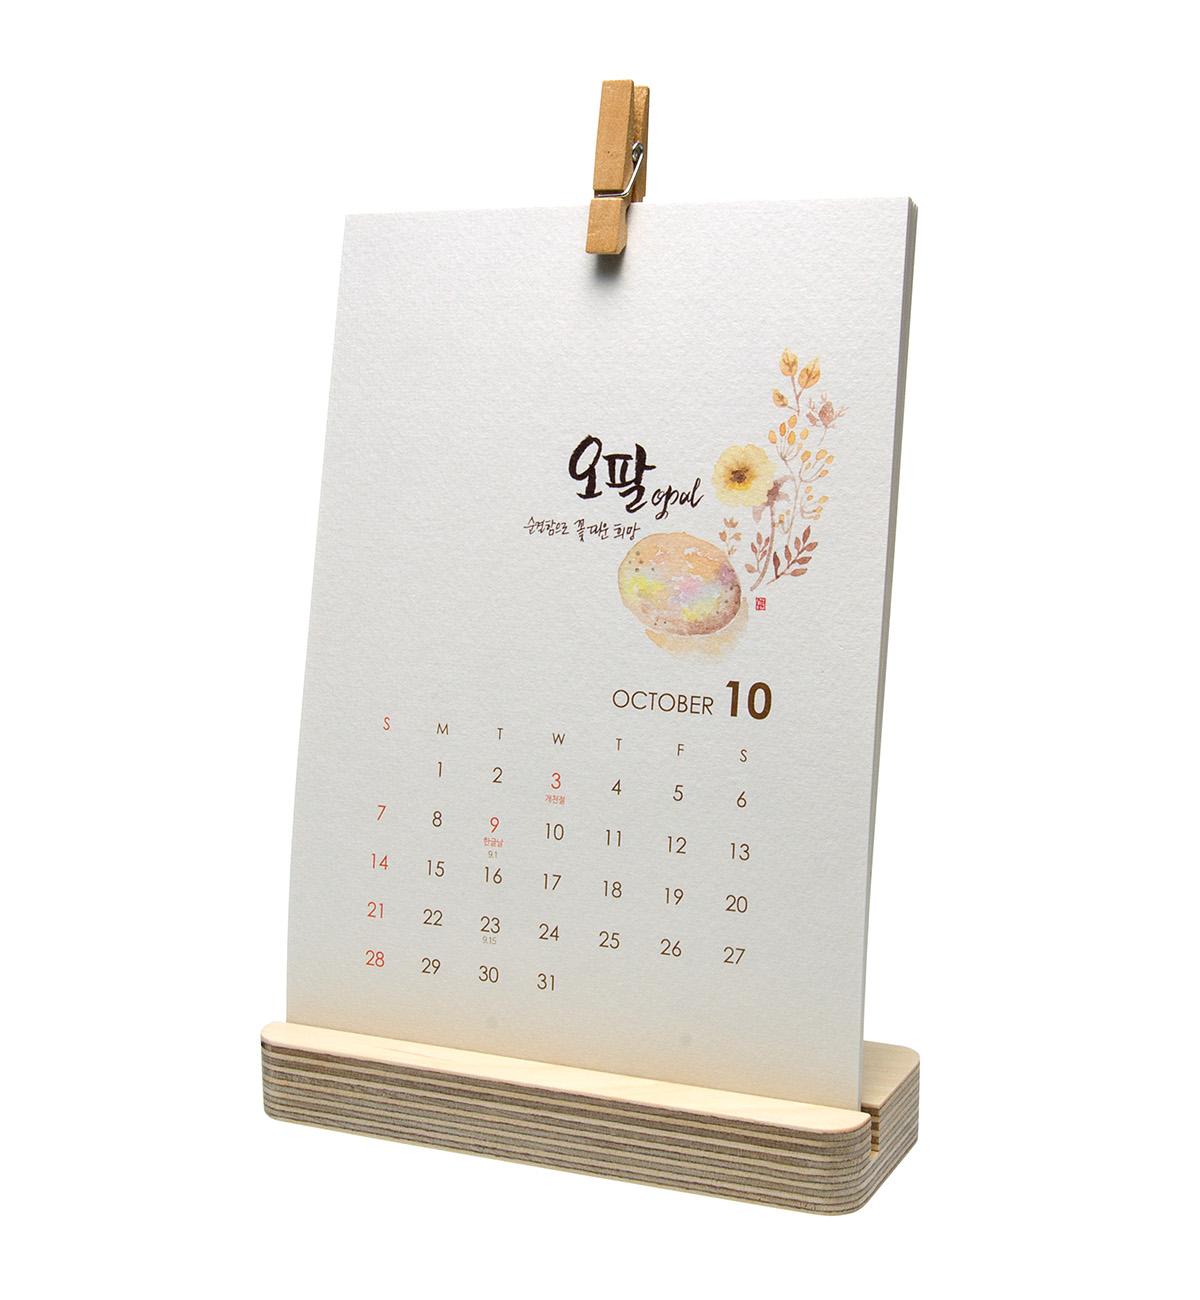 2018 Birthstone Calendar Thumbnail Image 2